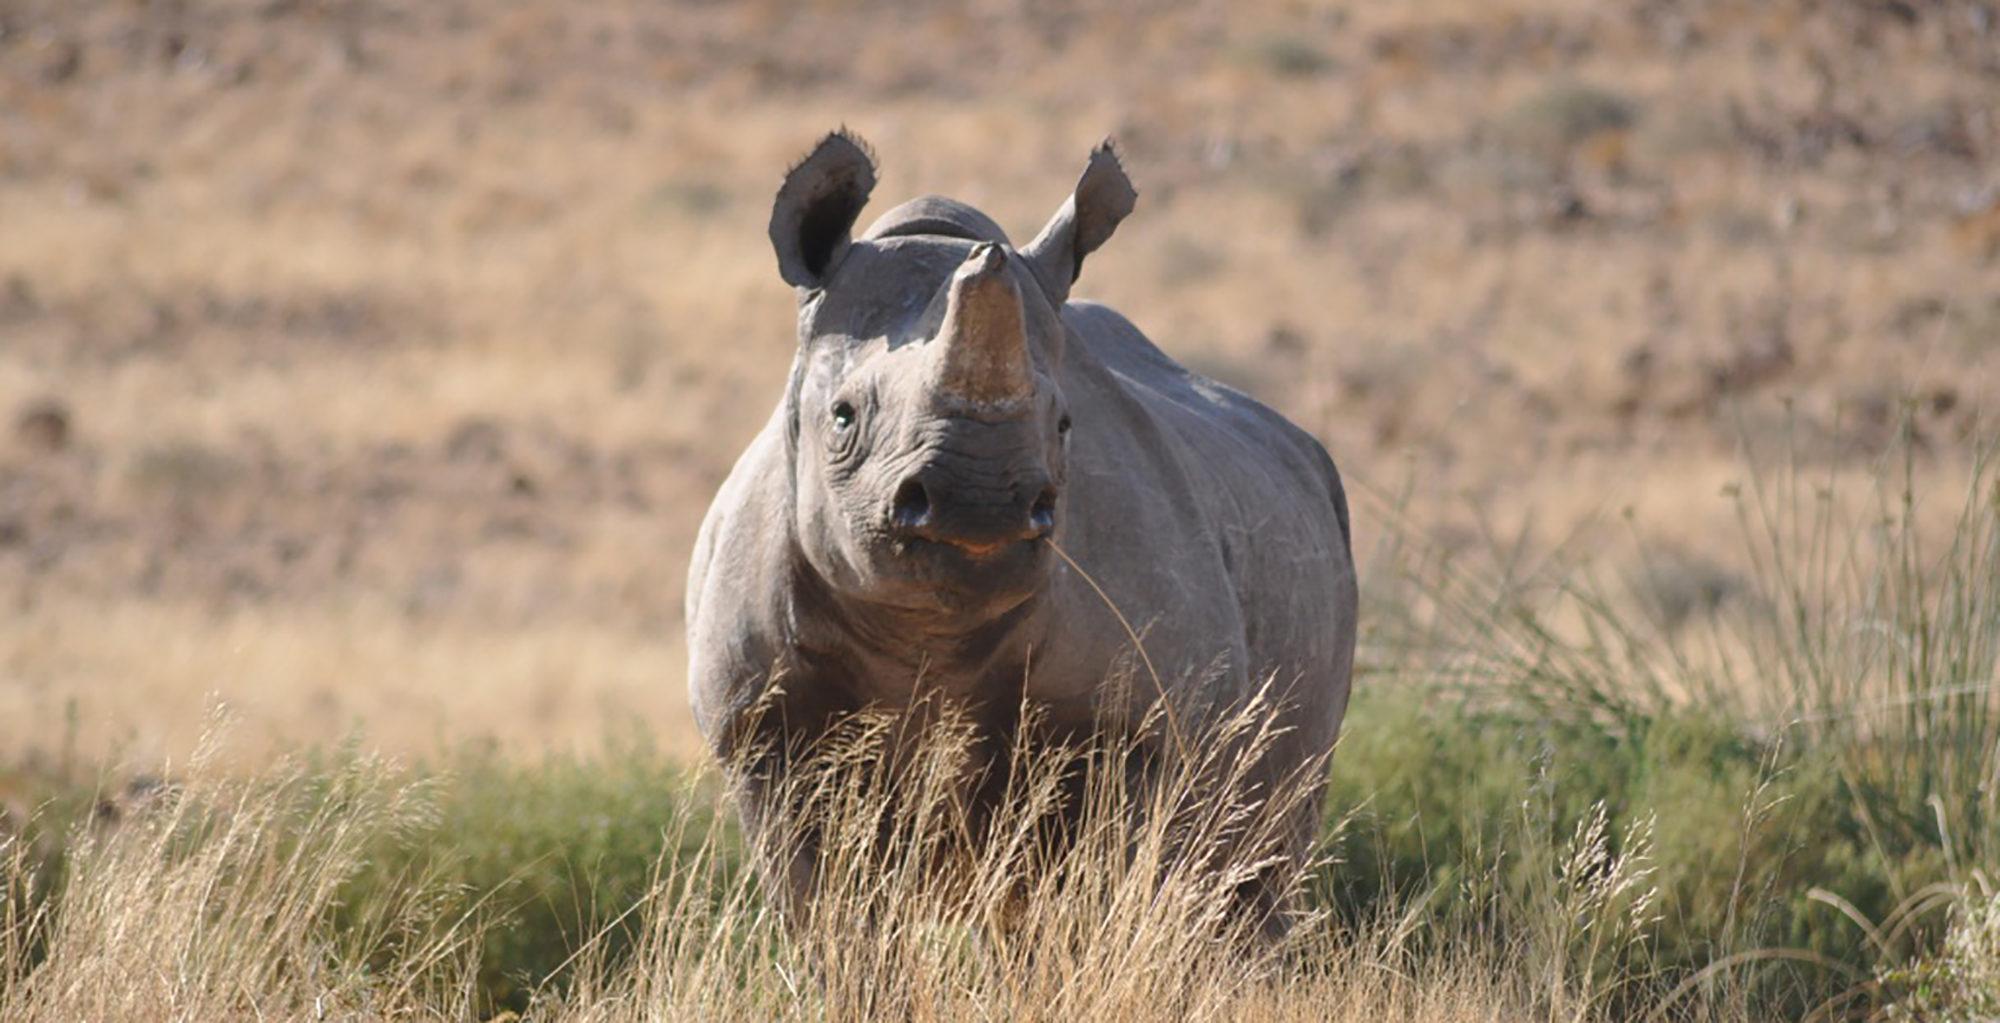 Namibia-Tracks-and-Trails-Etosha-Black-Rhino